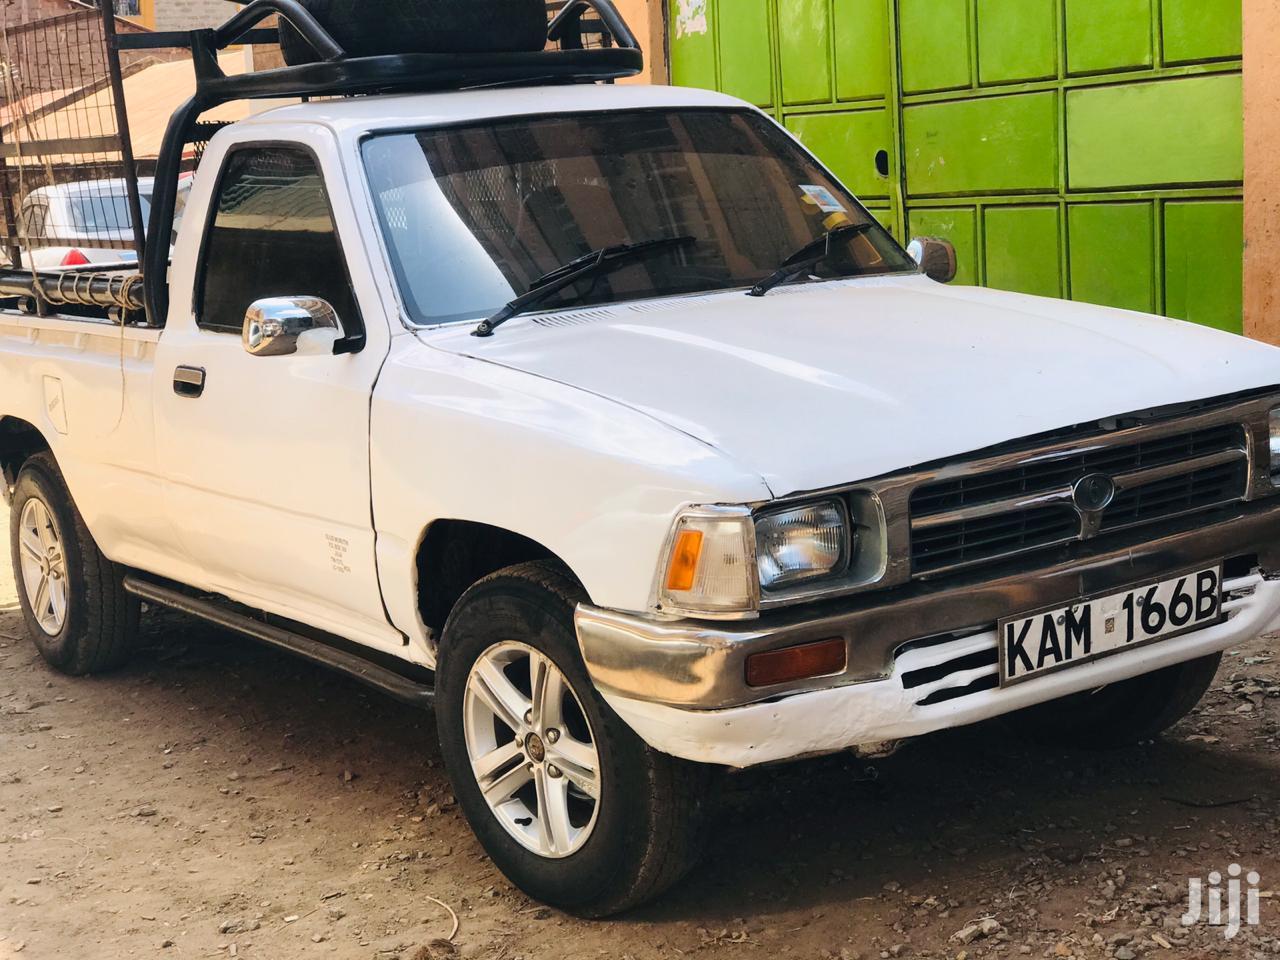 Kelebihan Toyota Hilux 1997 Spesifikasi